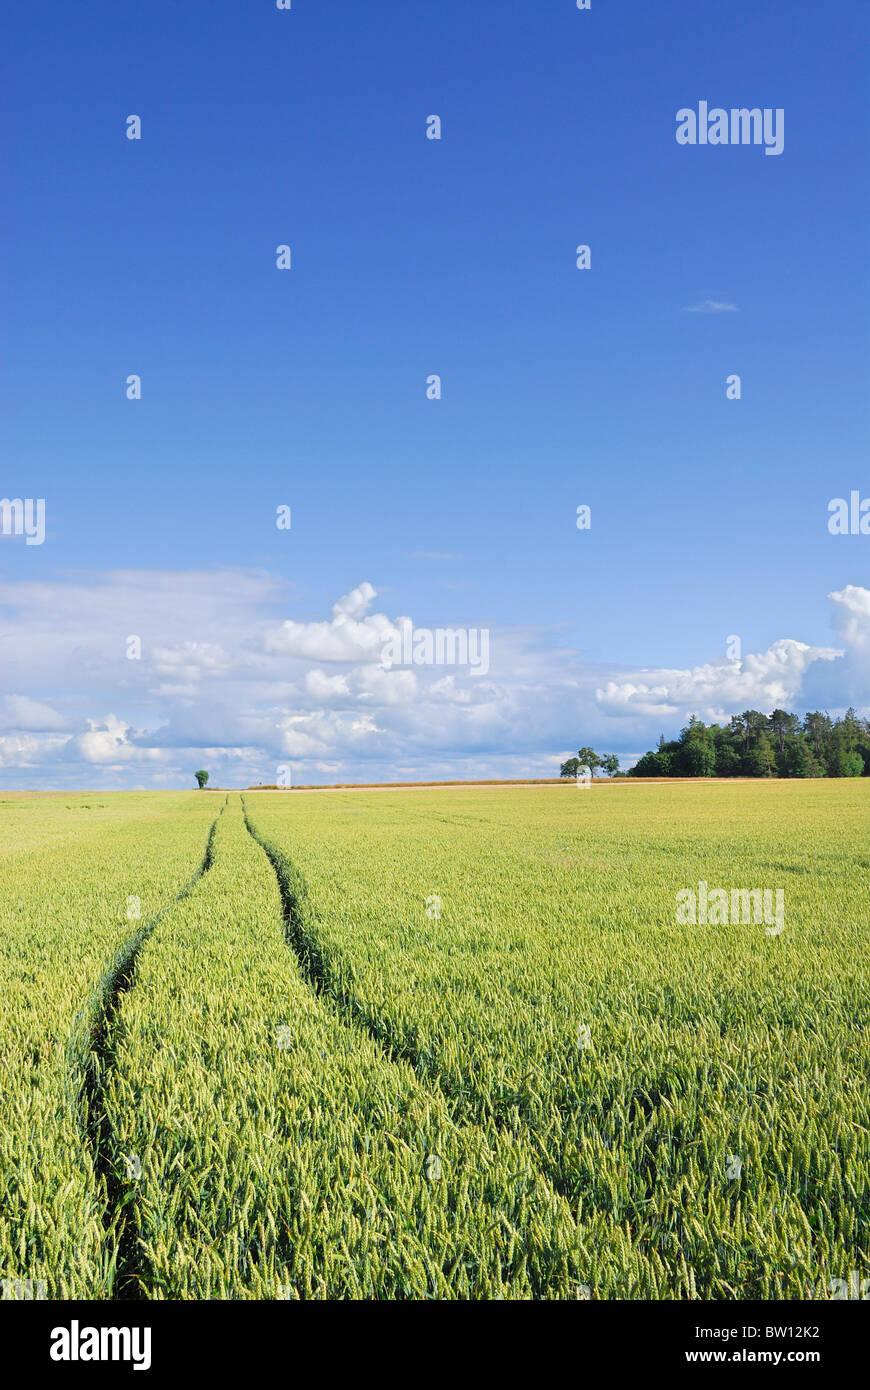 Wheat field and blue sky, Östergötland, Sweden, Europe Stock Photo